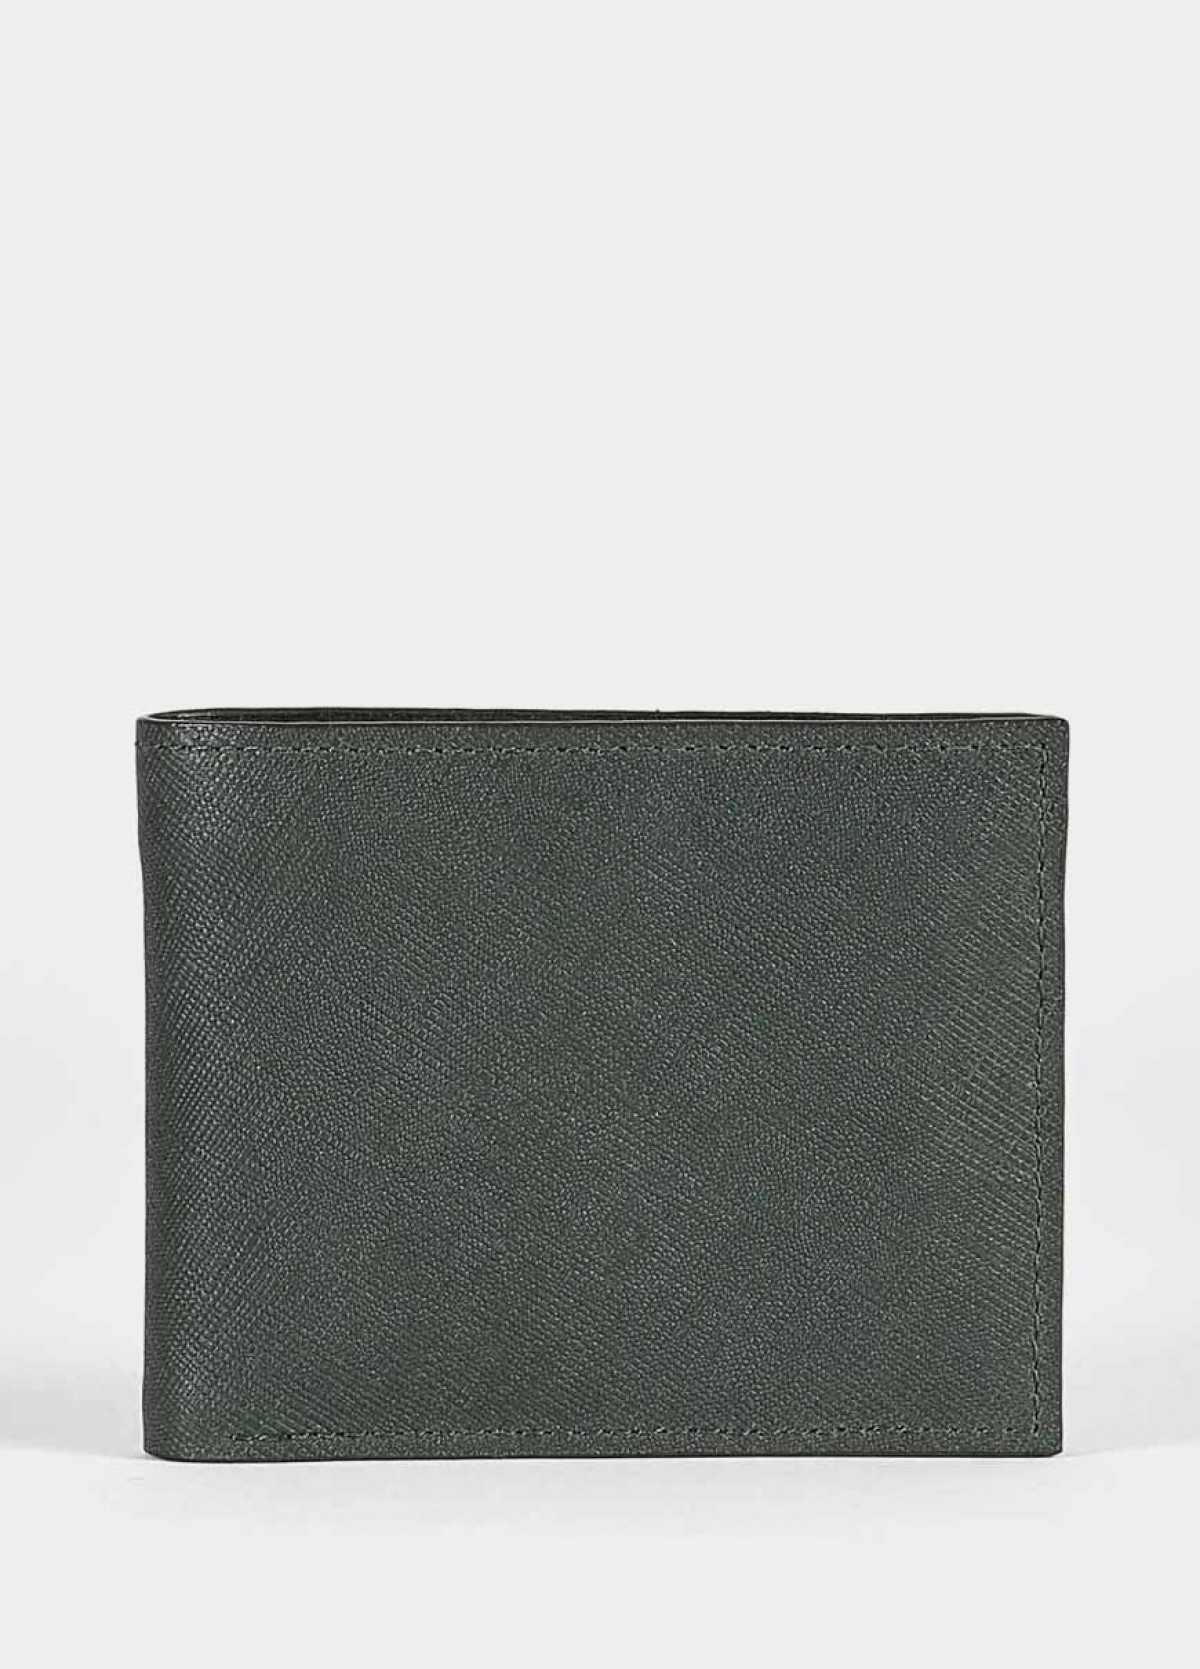 The Green Men Wallet